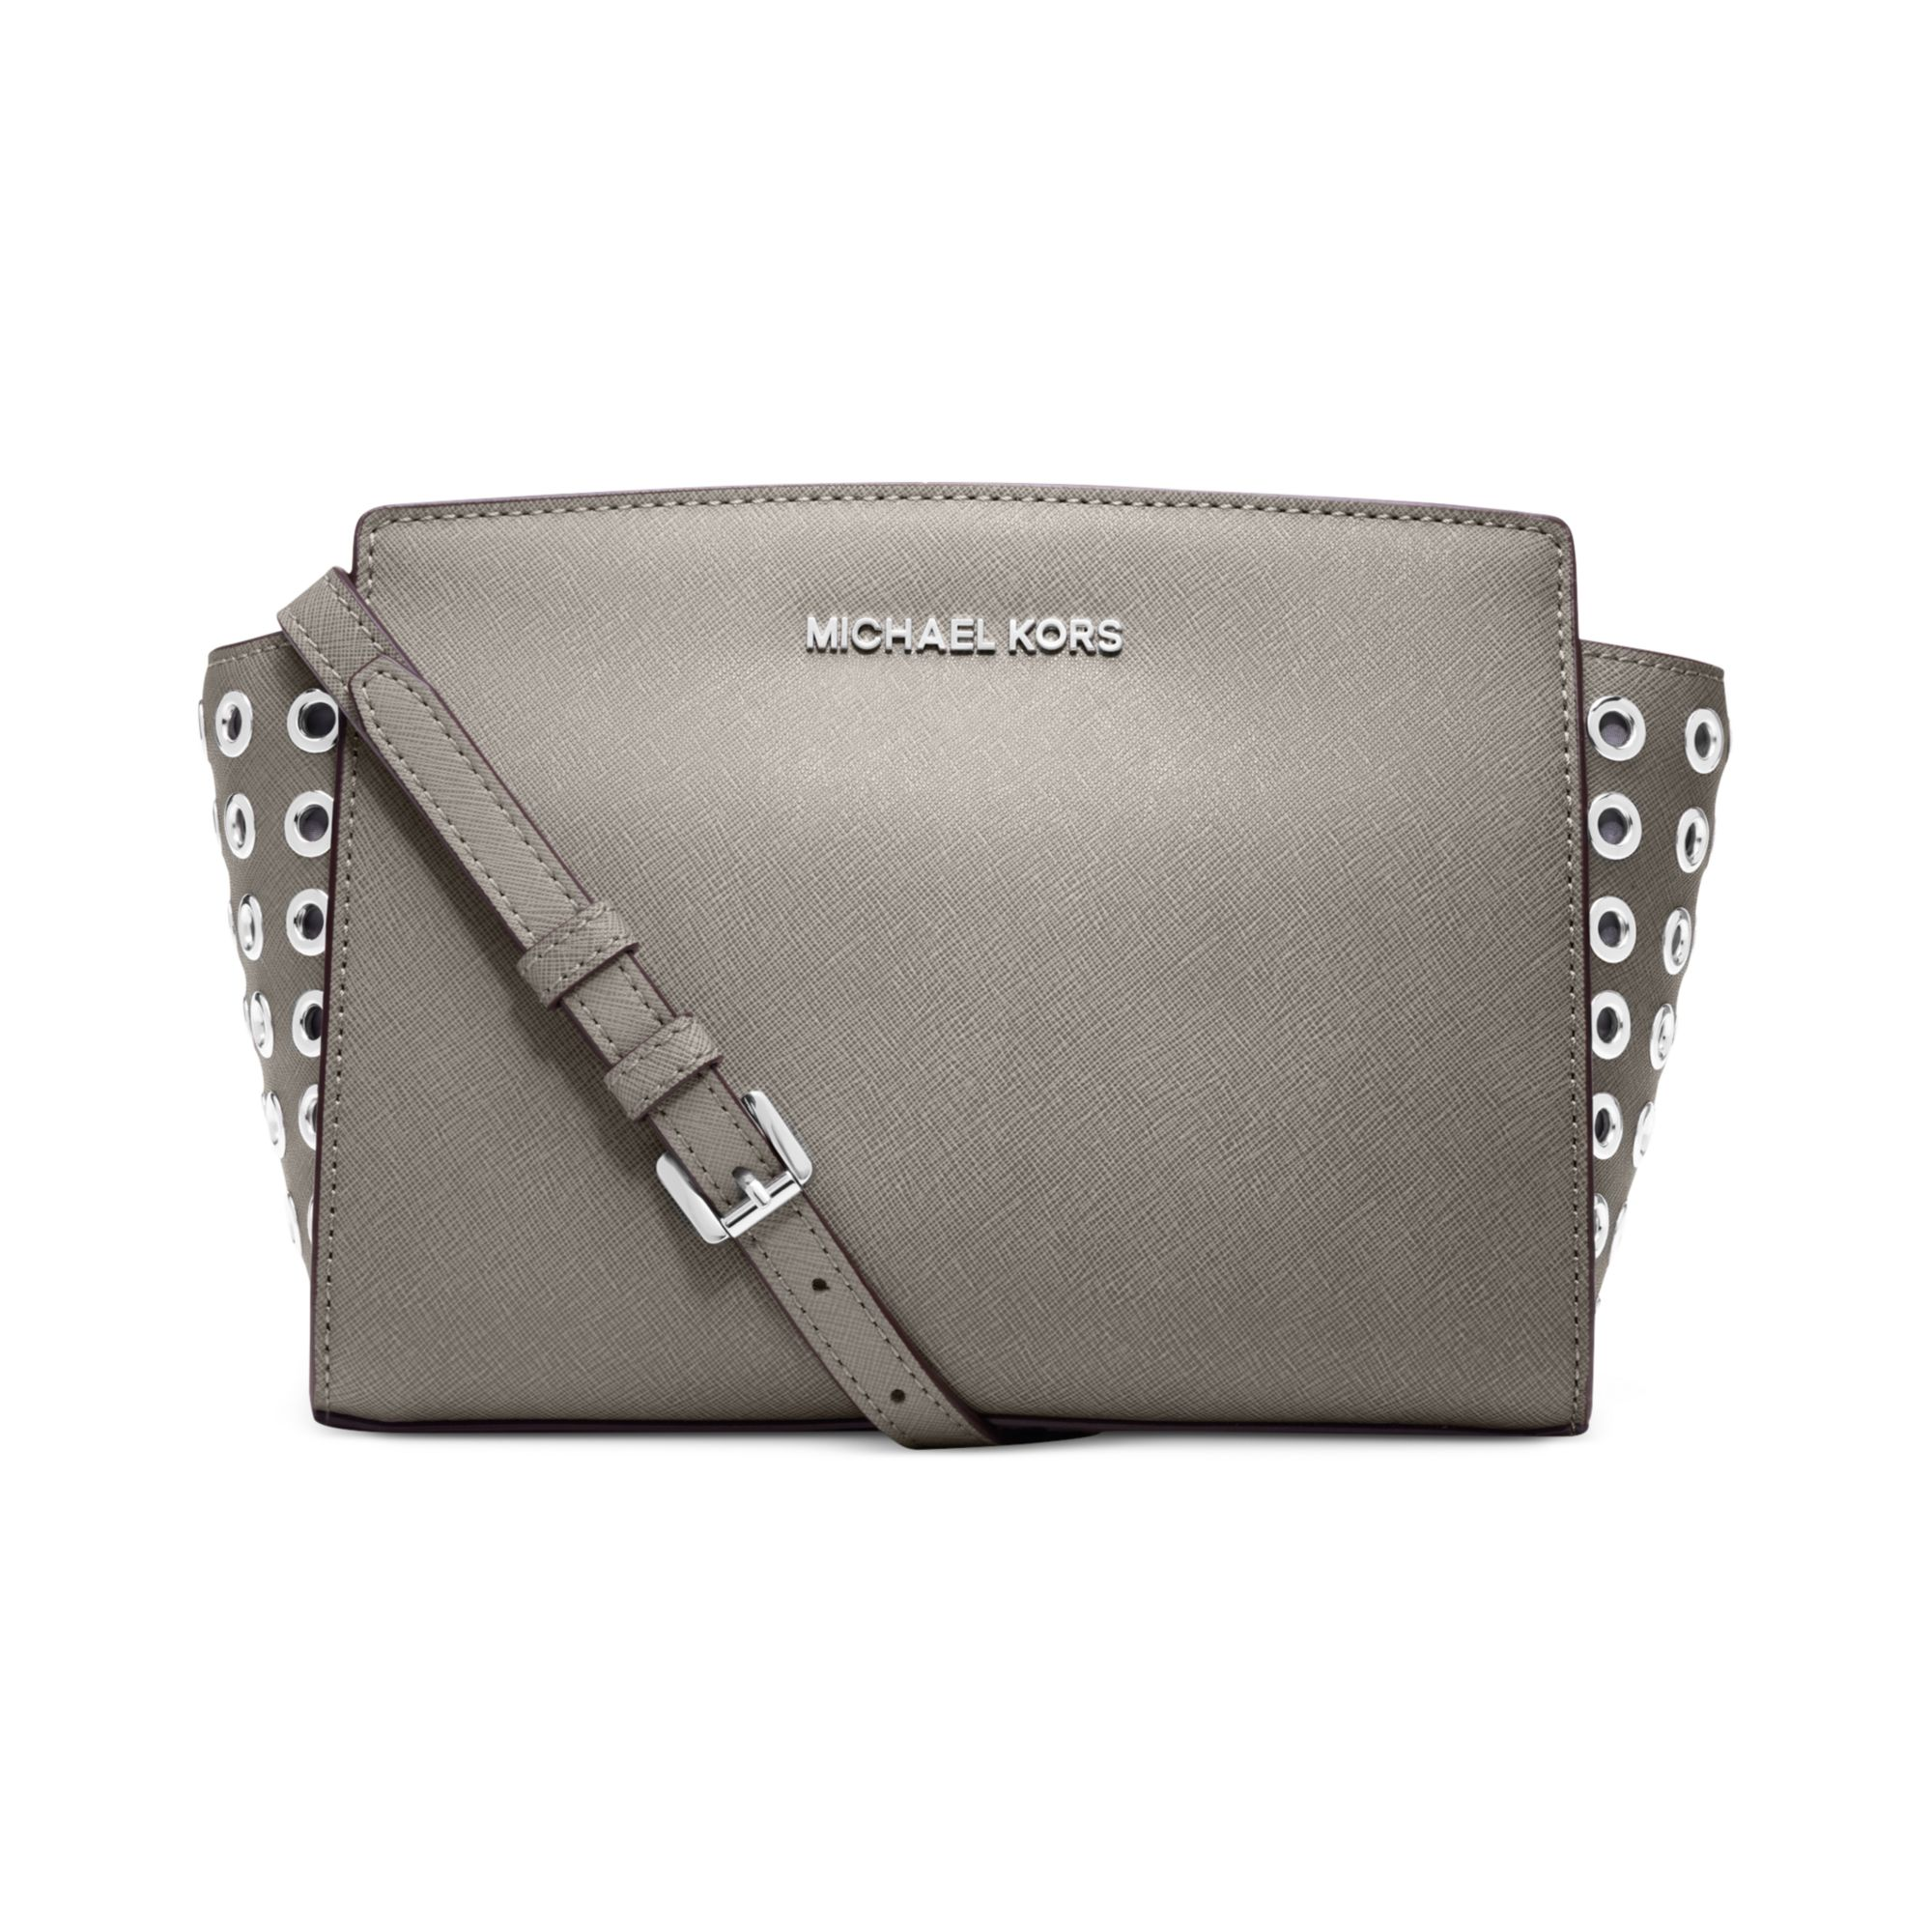 274bef51db3b Lyst - Michael Kors Bag in Gray